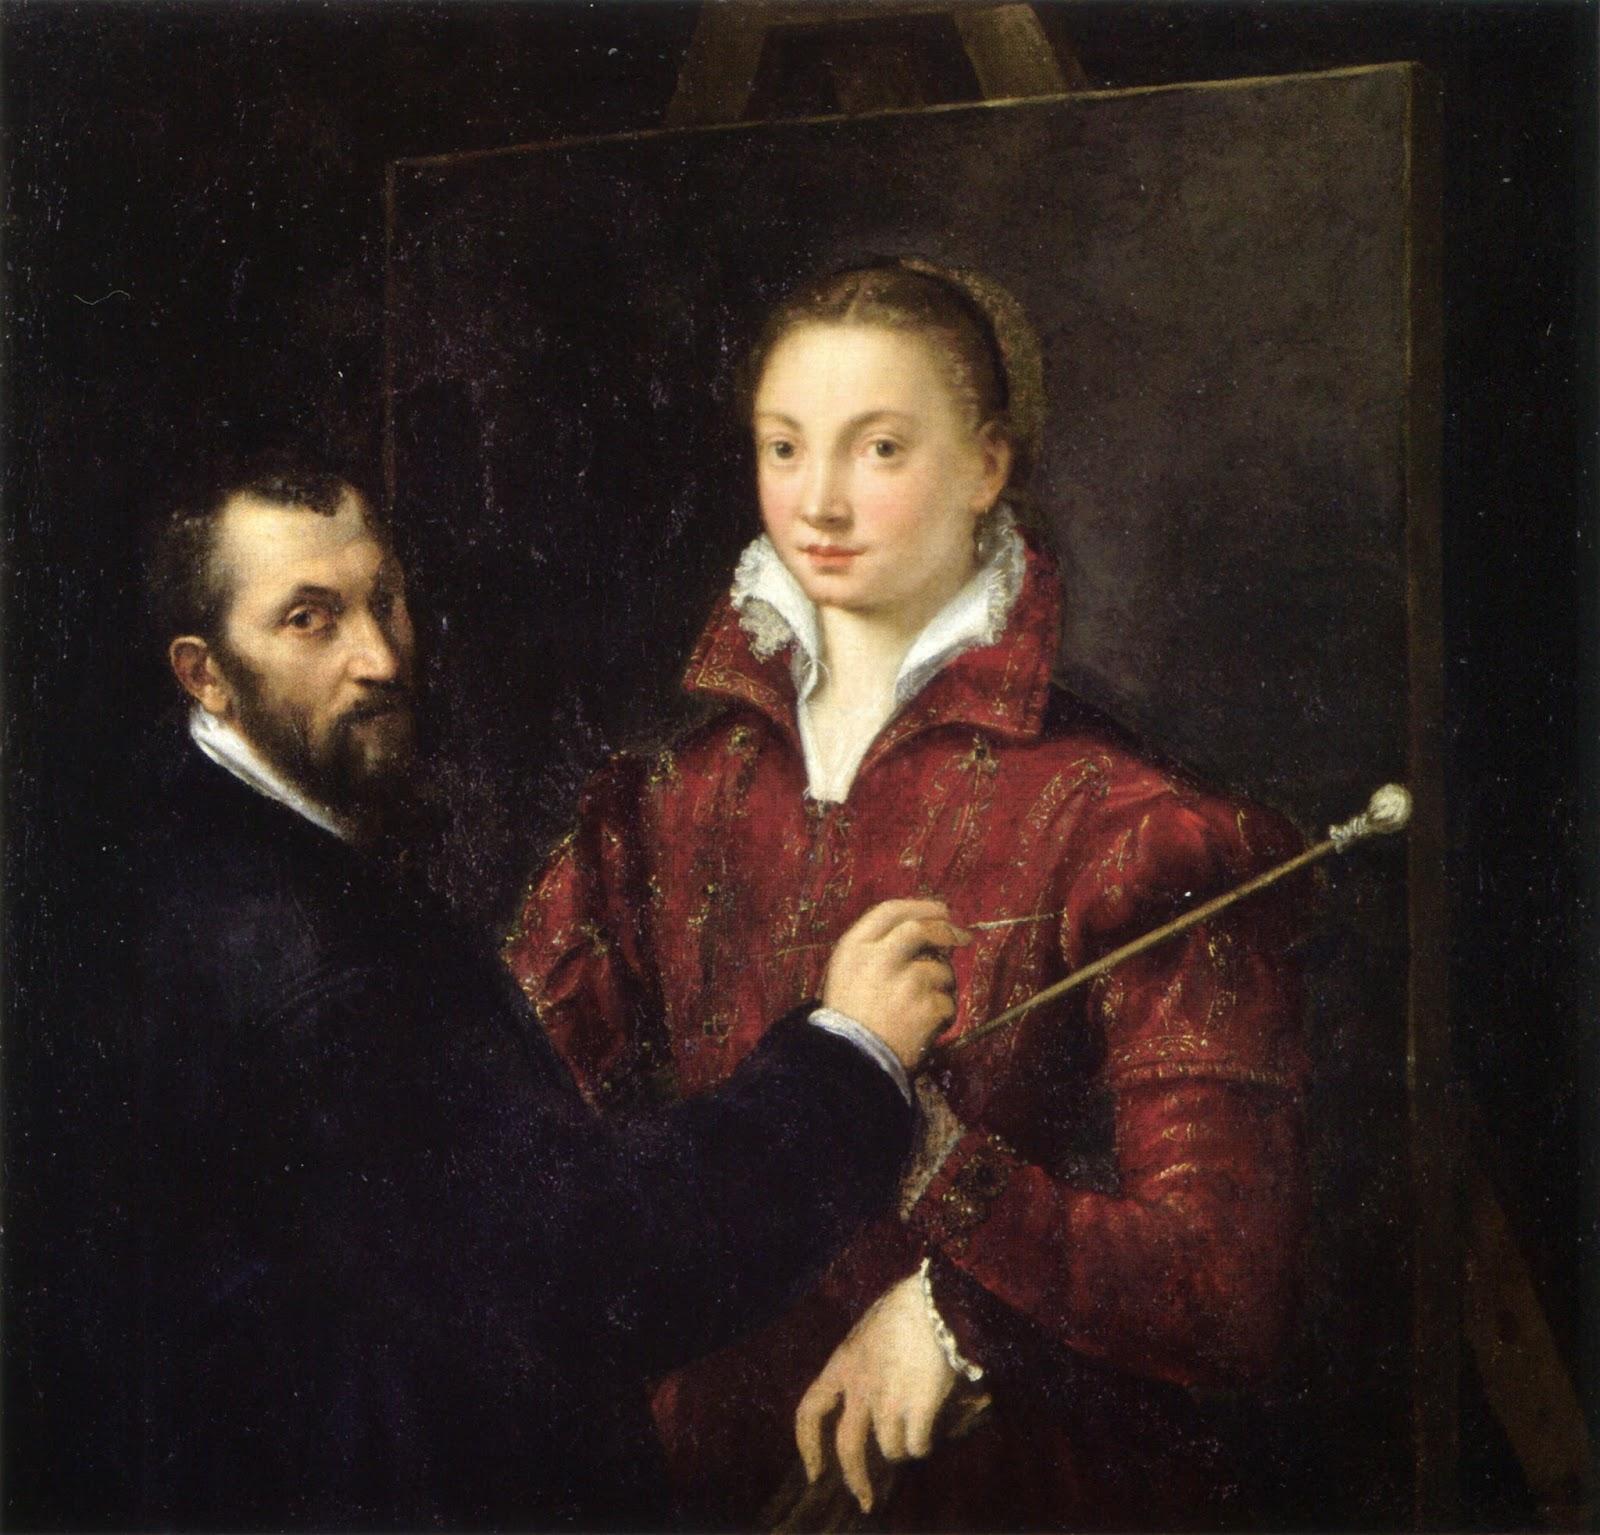 Bernardino Campi, Self Portrait, Portraits of Painters, Fine arts, Painter Bernardino Campi